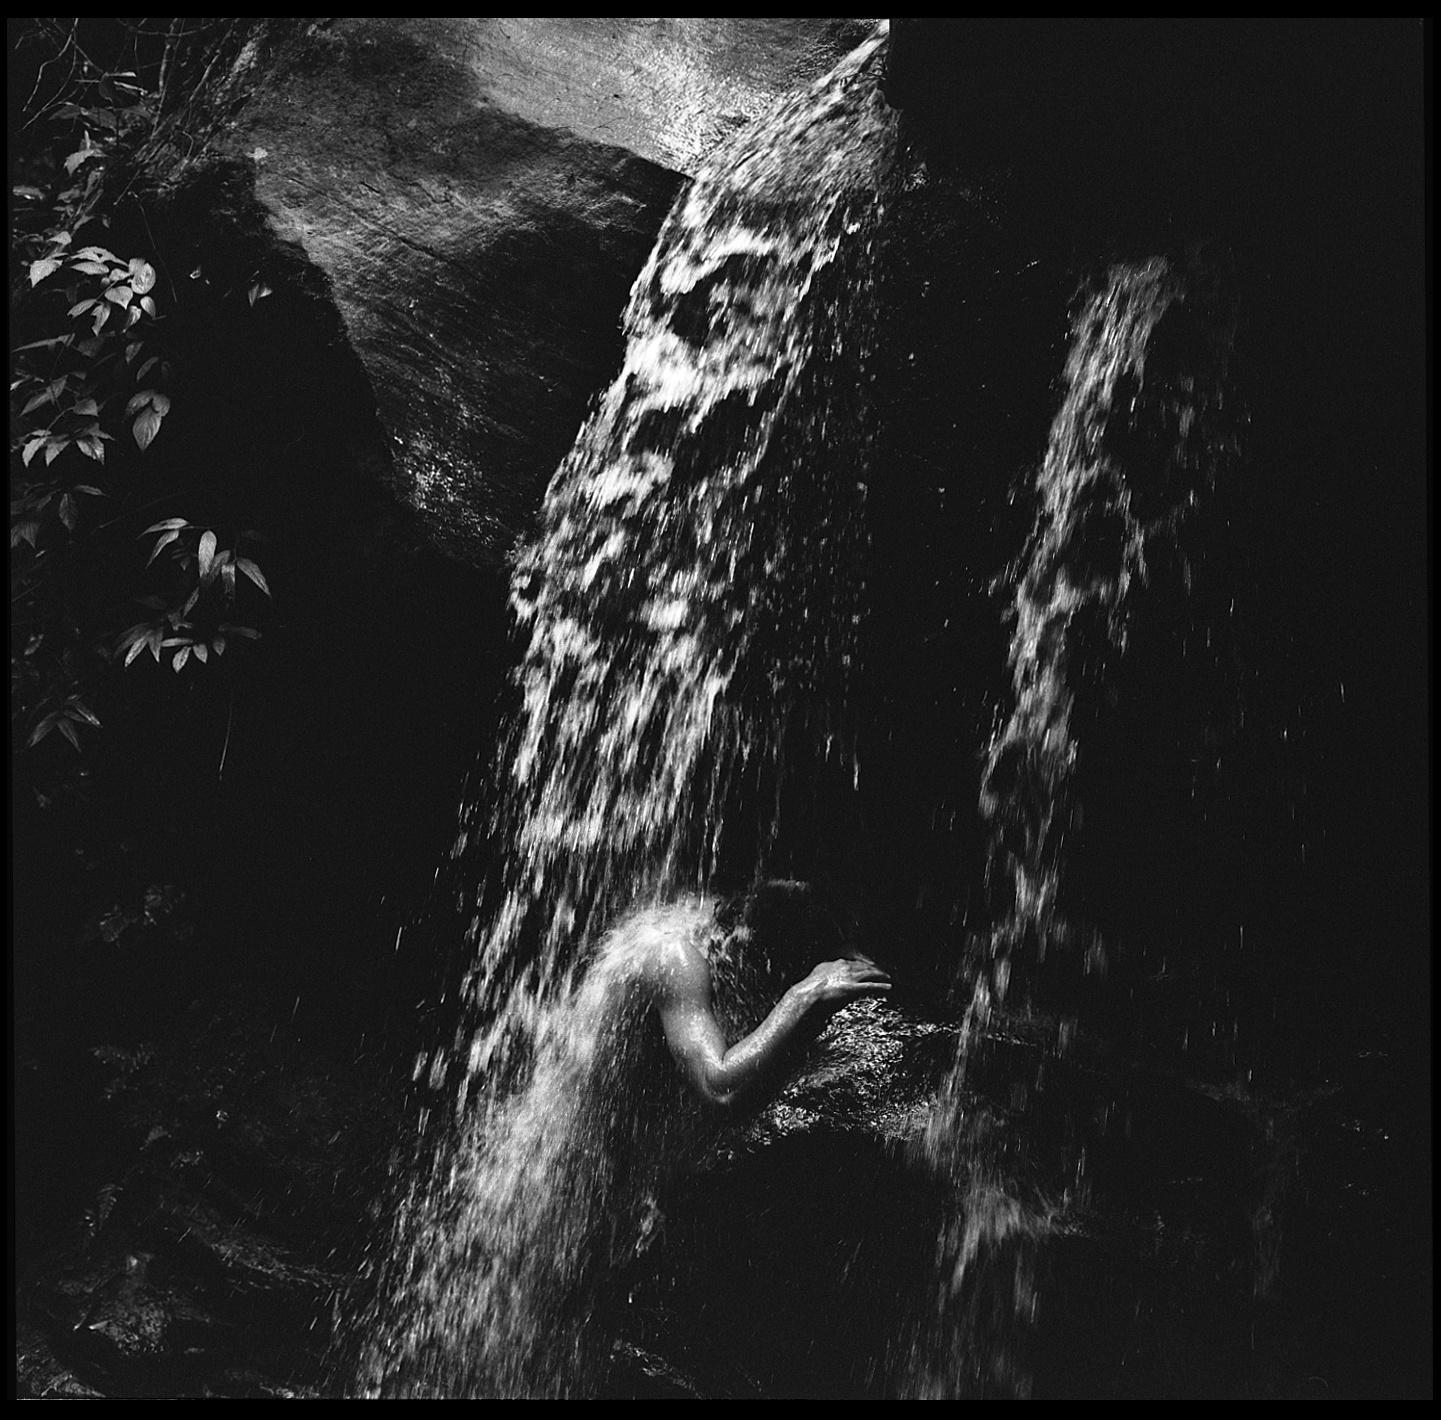 Cachoeiras - Rio Waterfalls